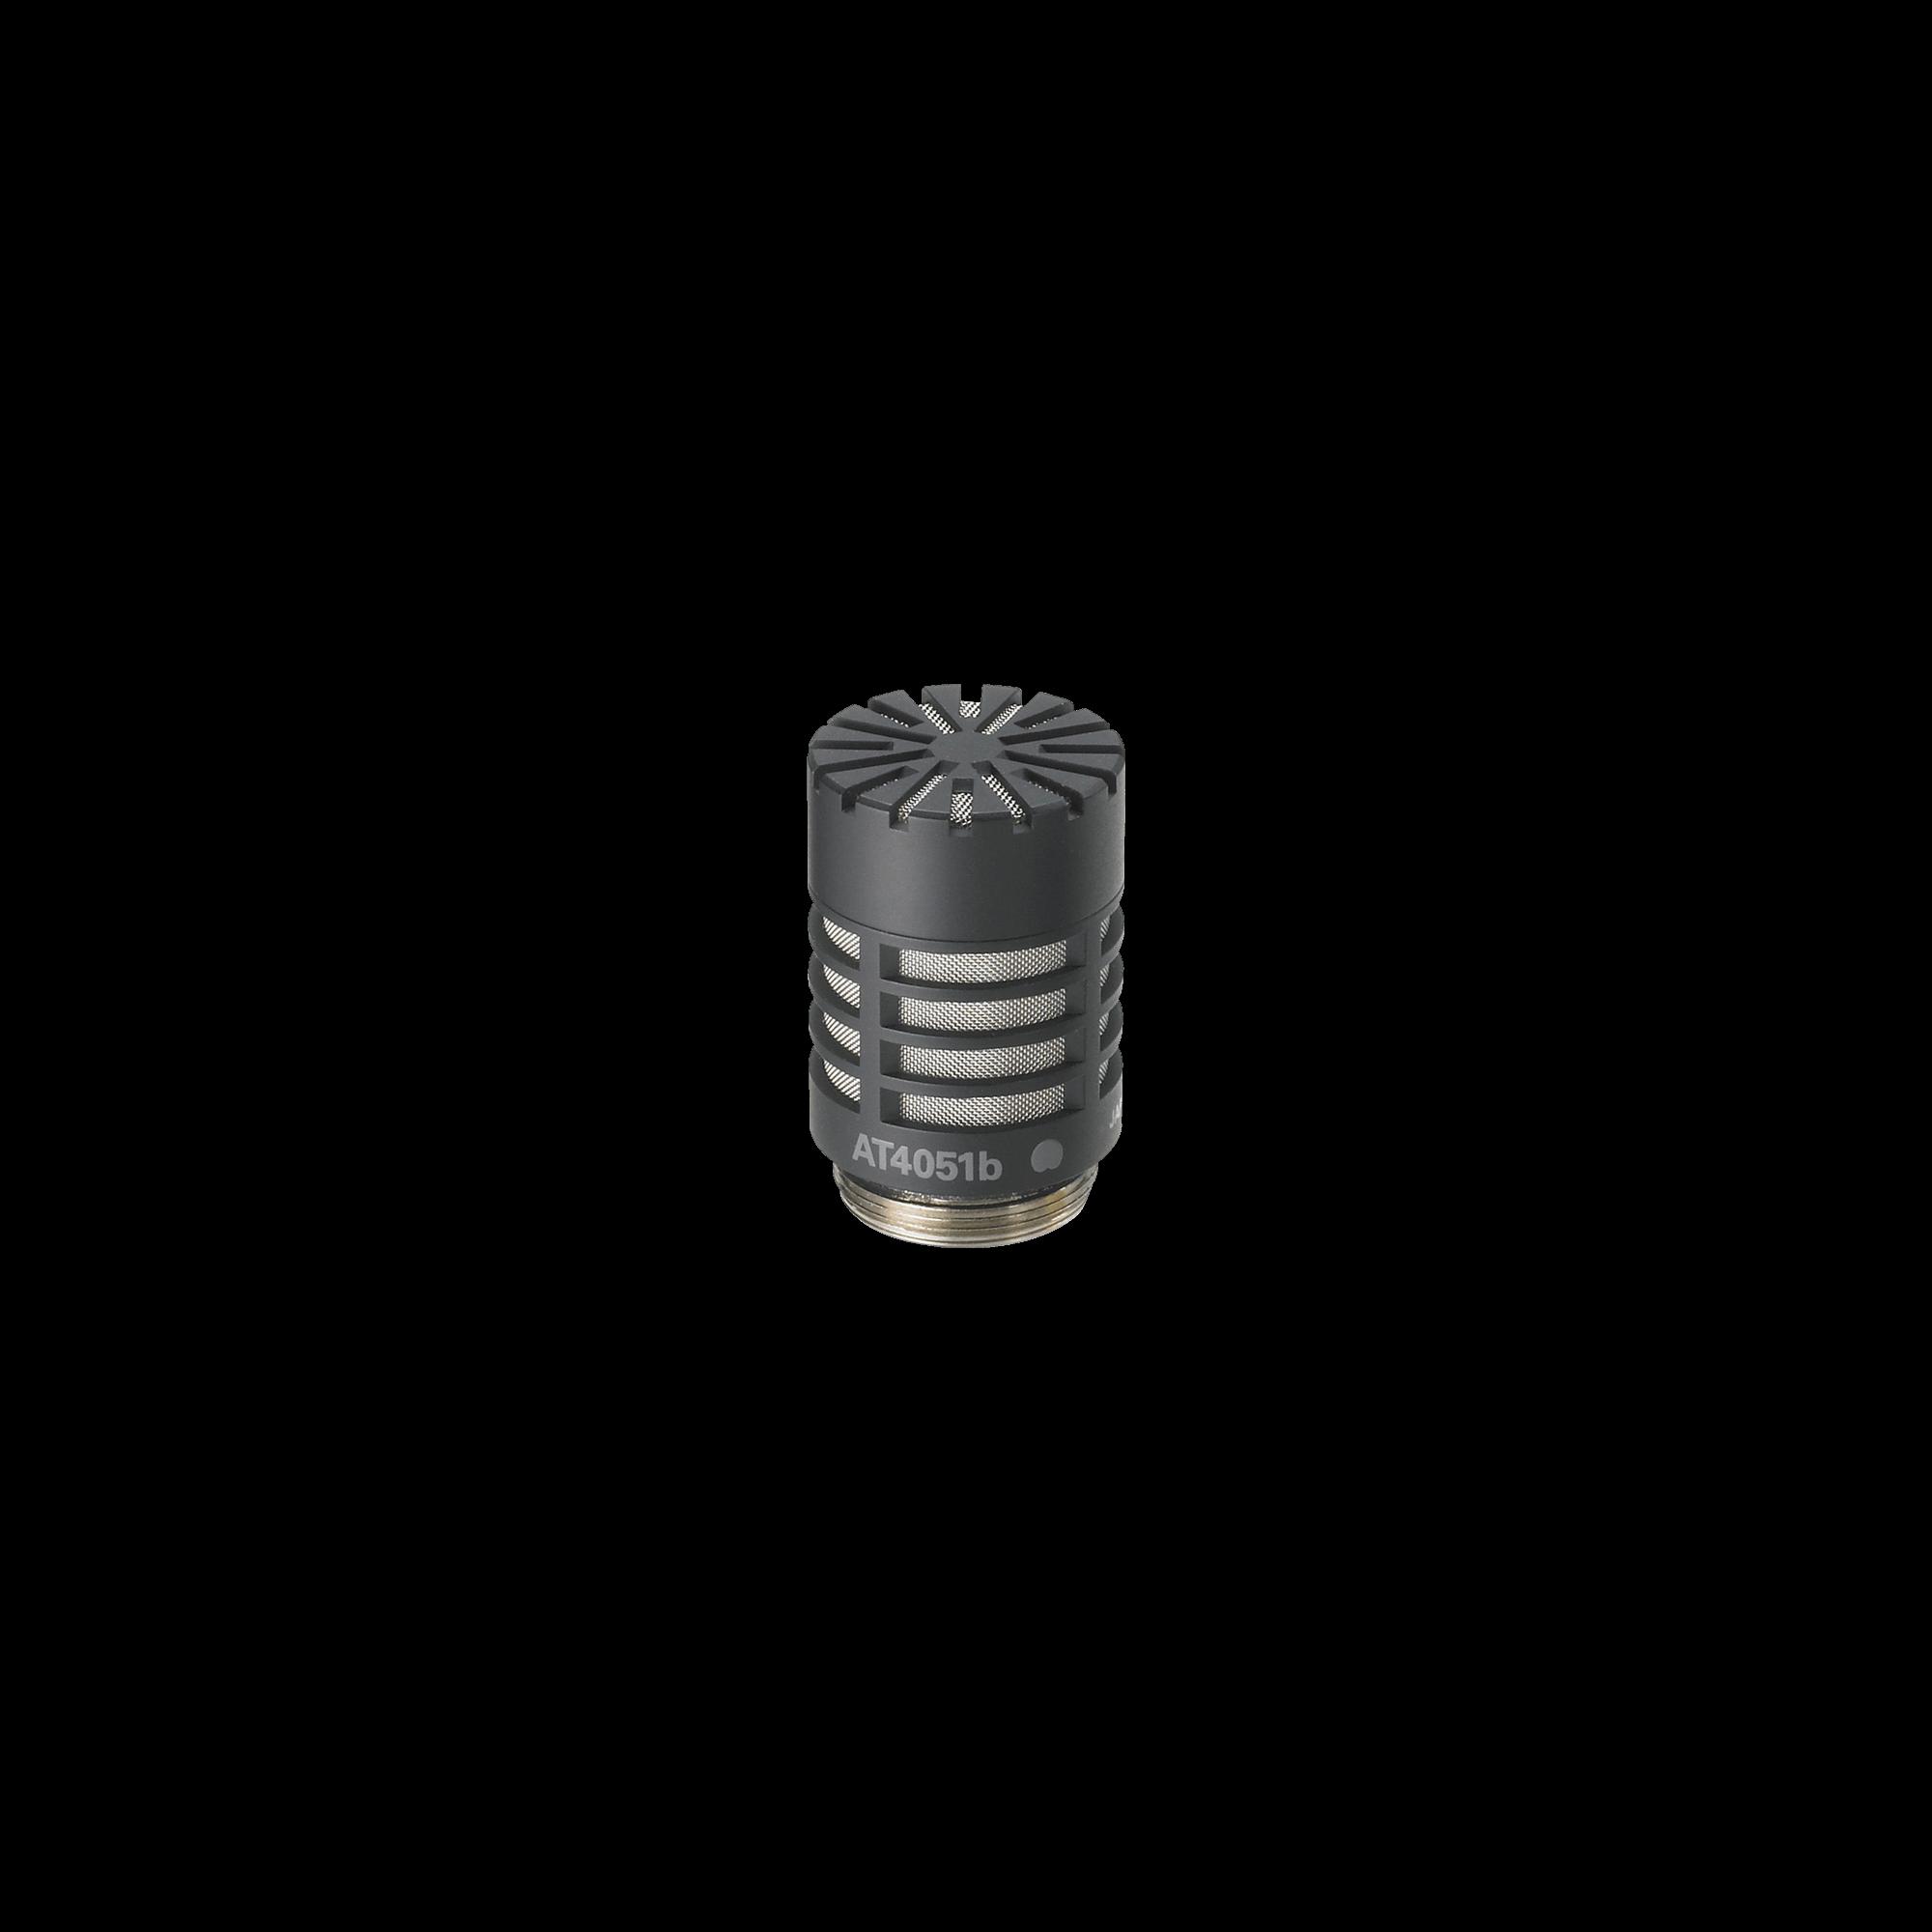 Audio-Technica Cardioid Element Microphone Mount AT4051BEL